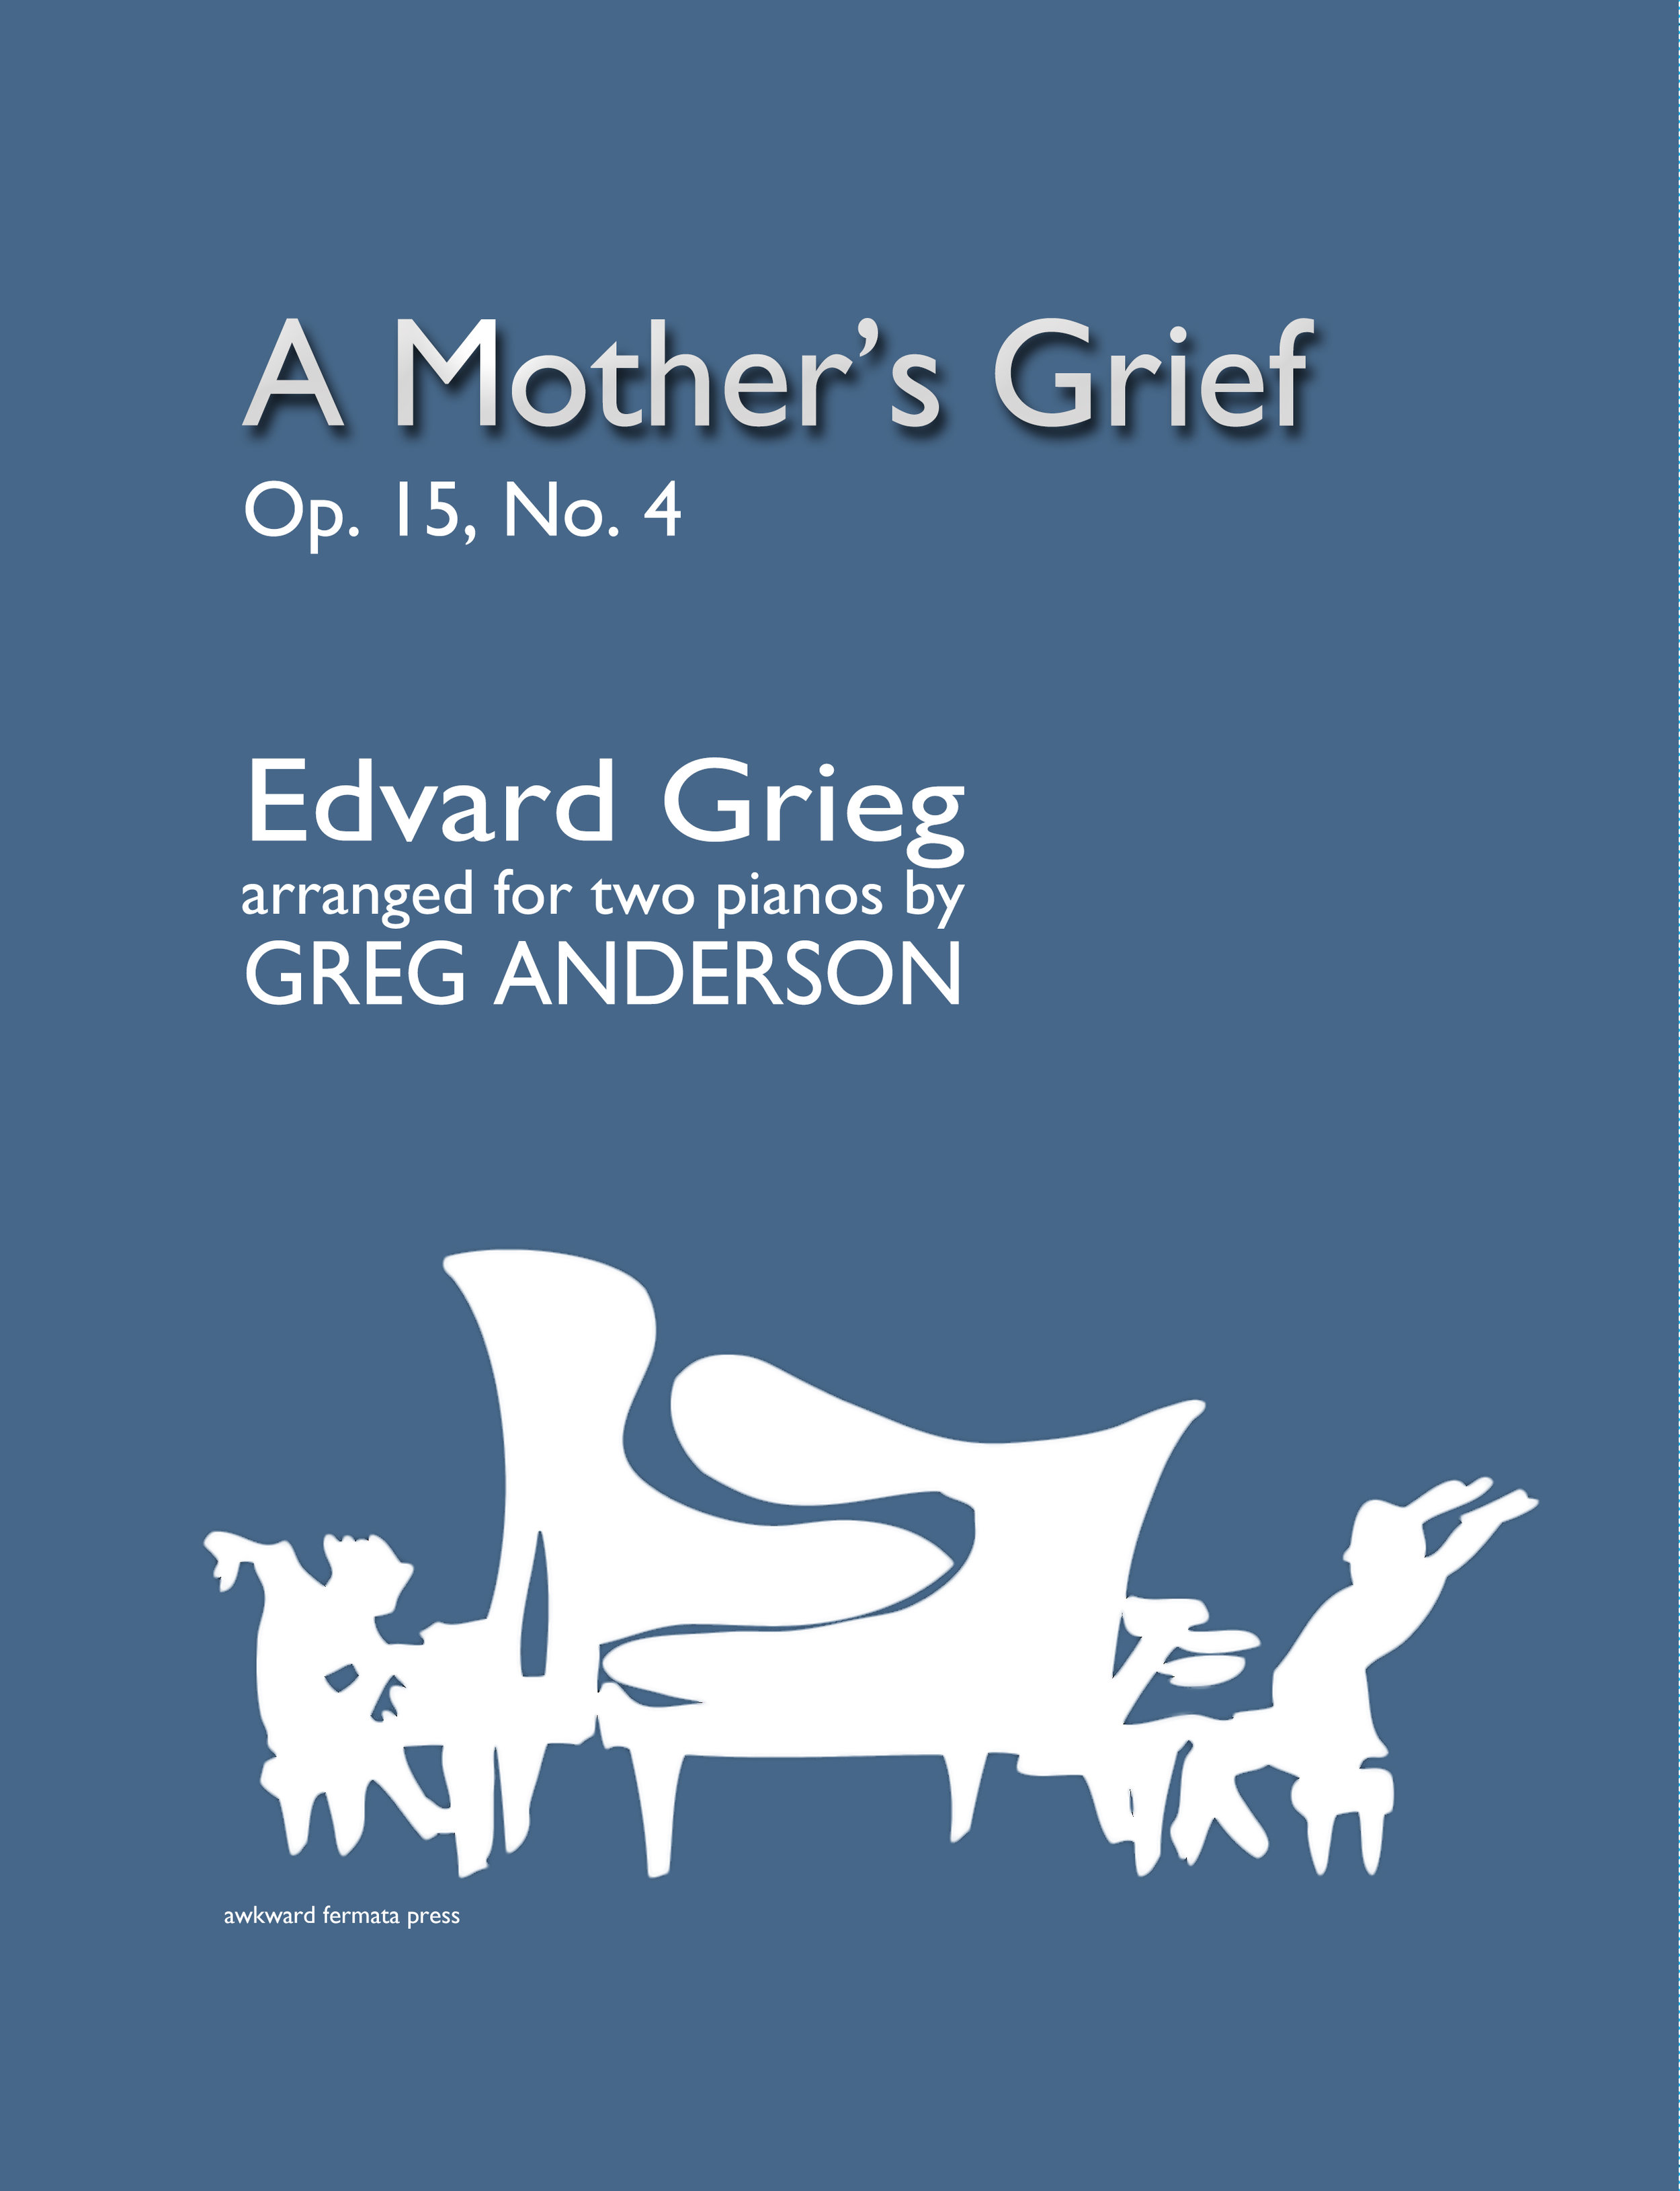 A Mother's Grief.jpg